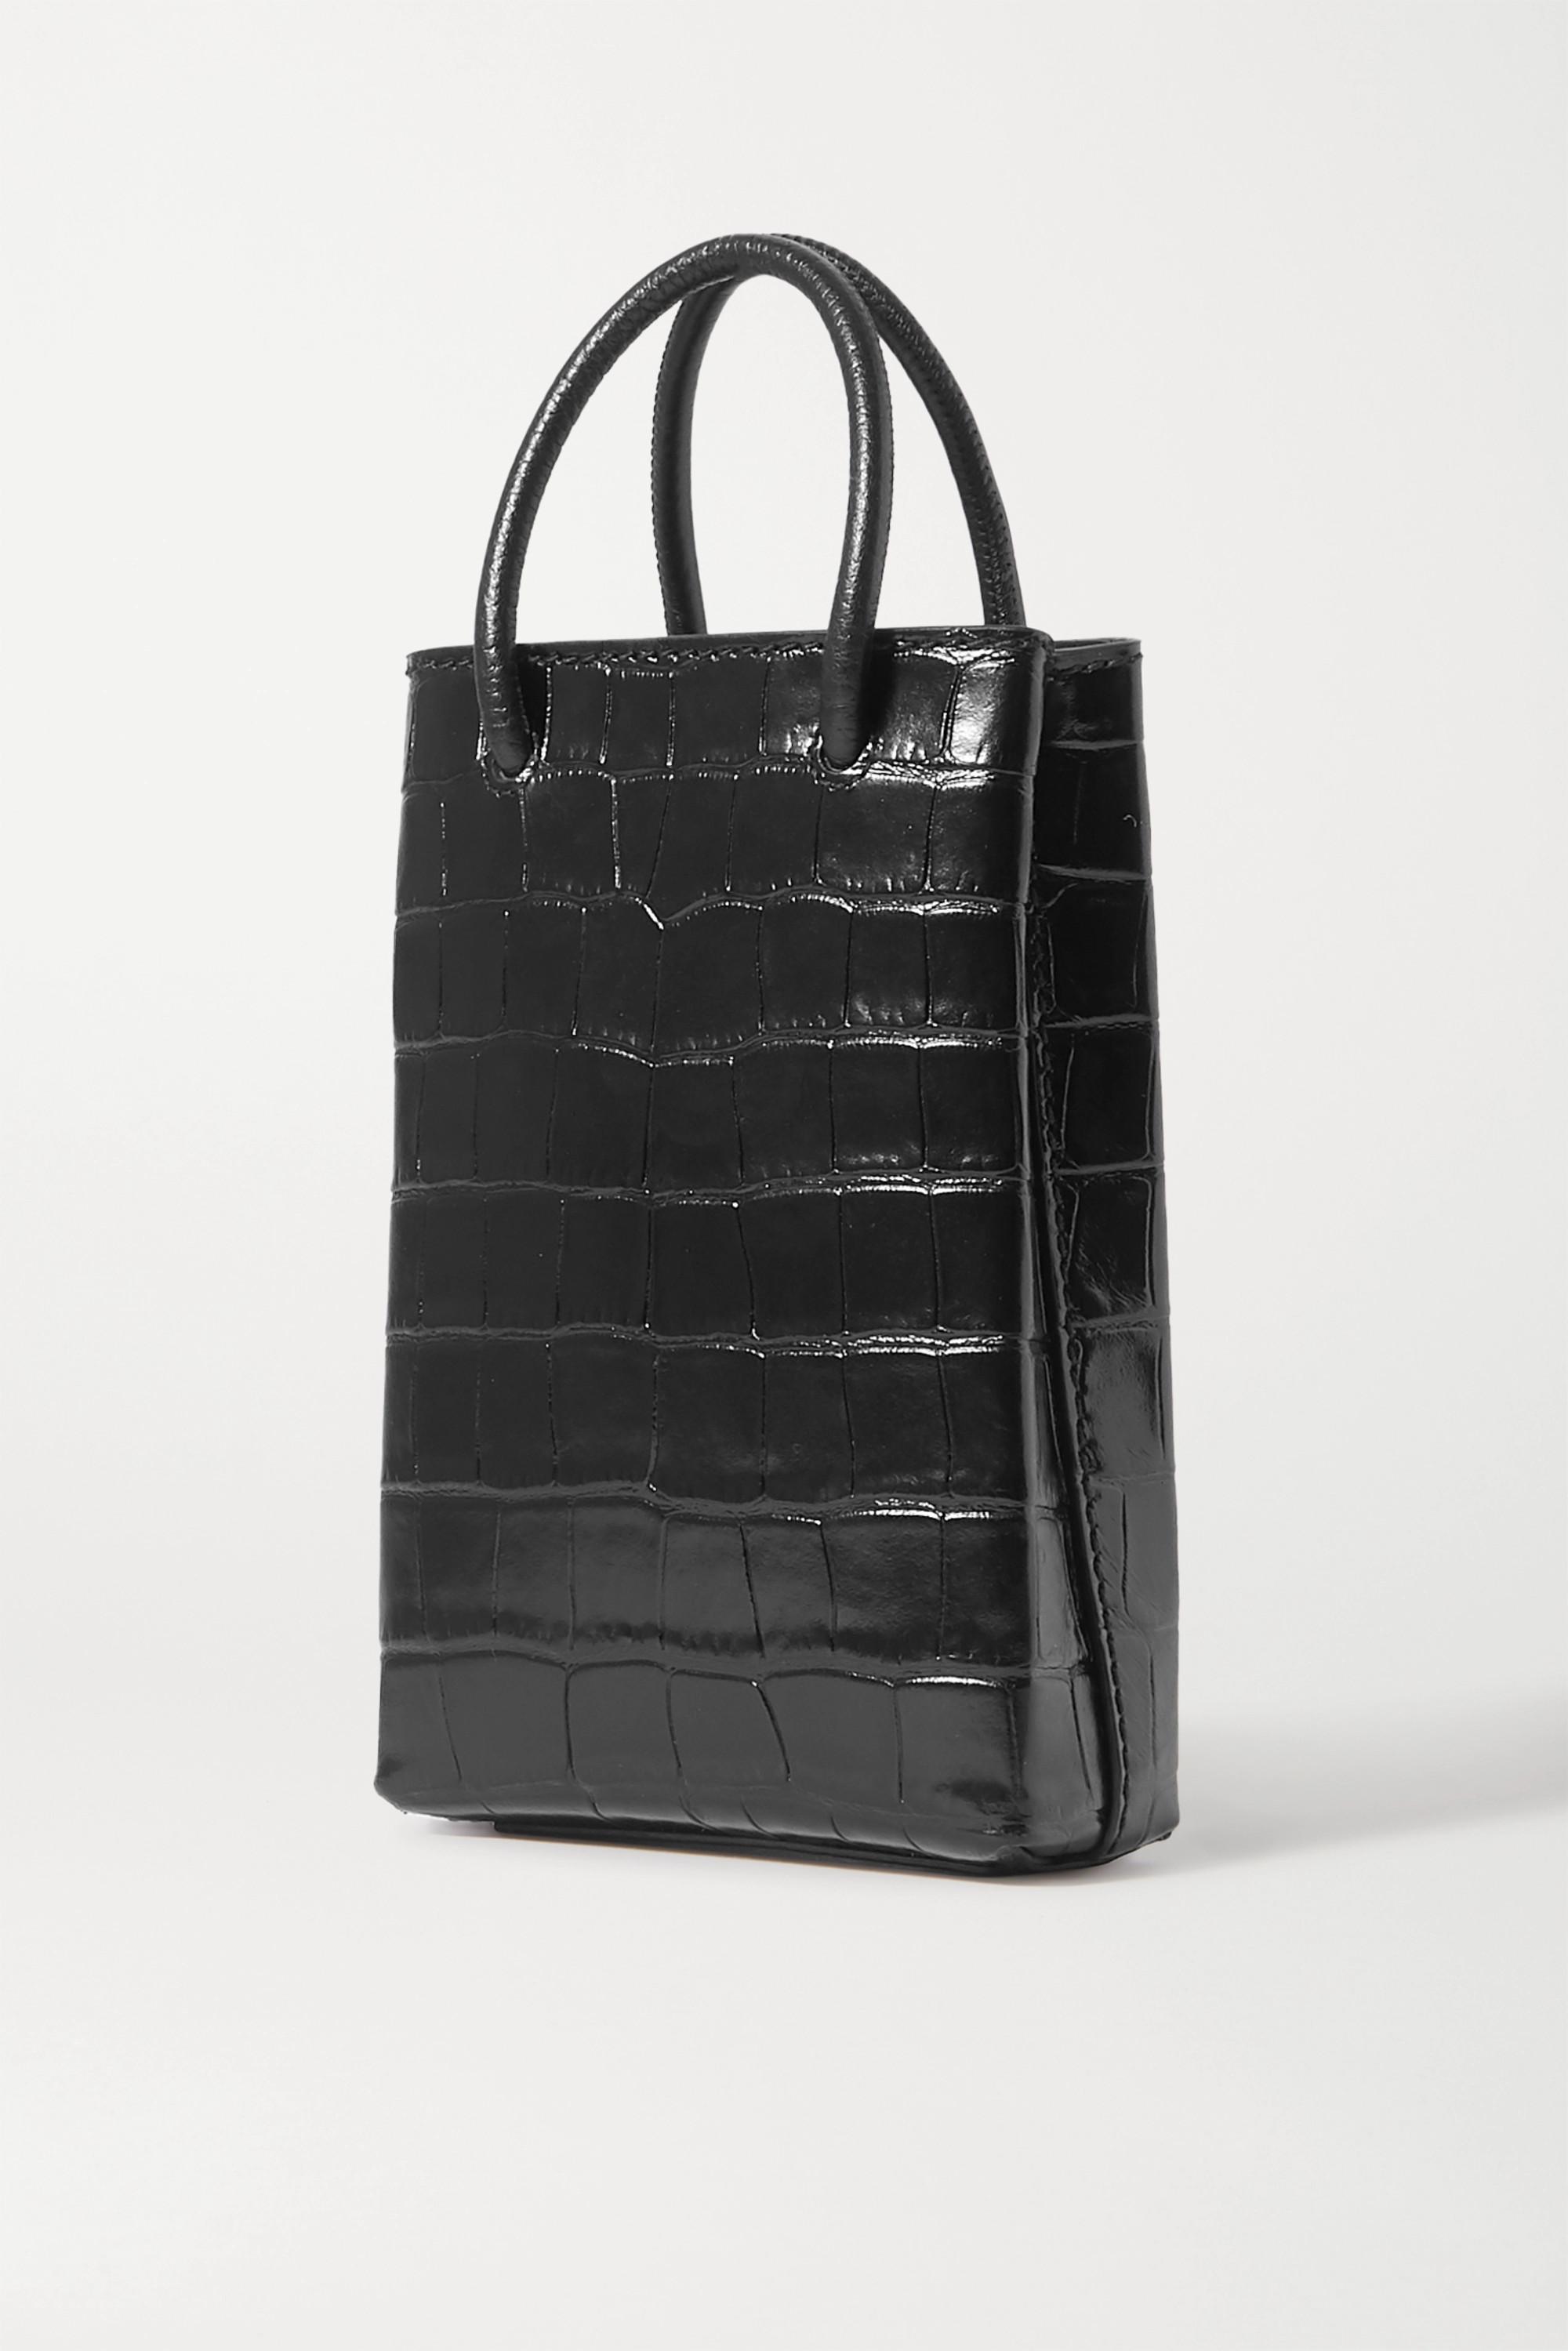 Balenciaga Shopping printed textured-leather shoulder bag